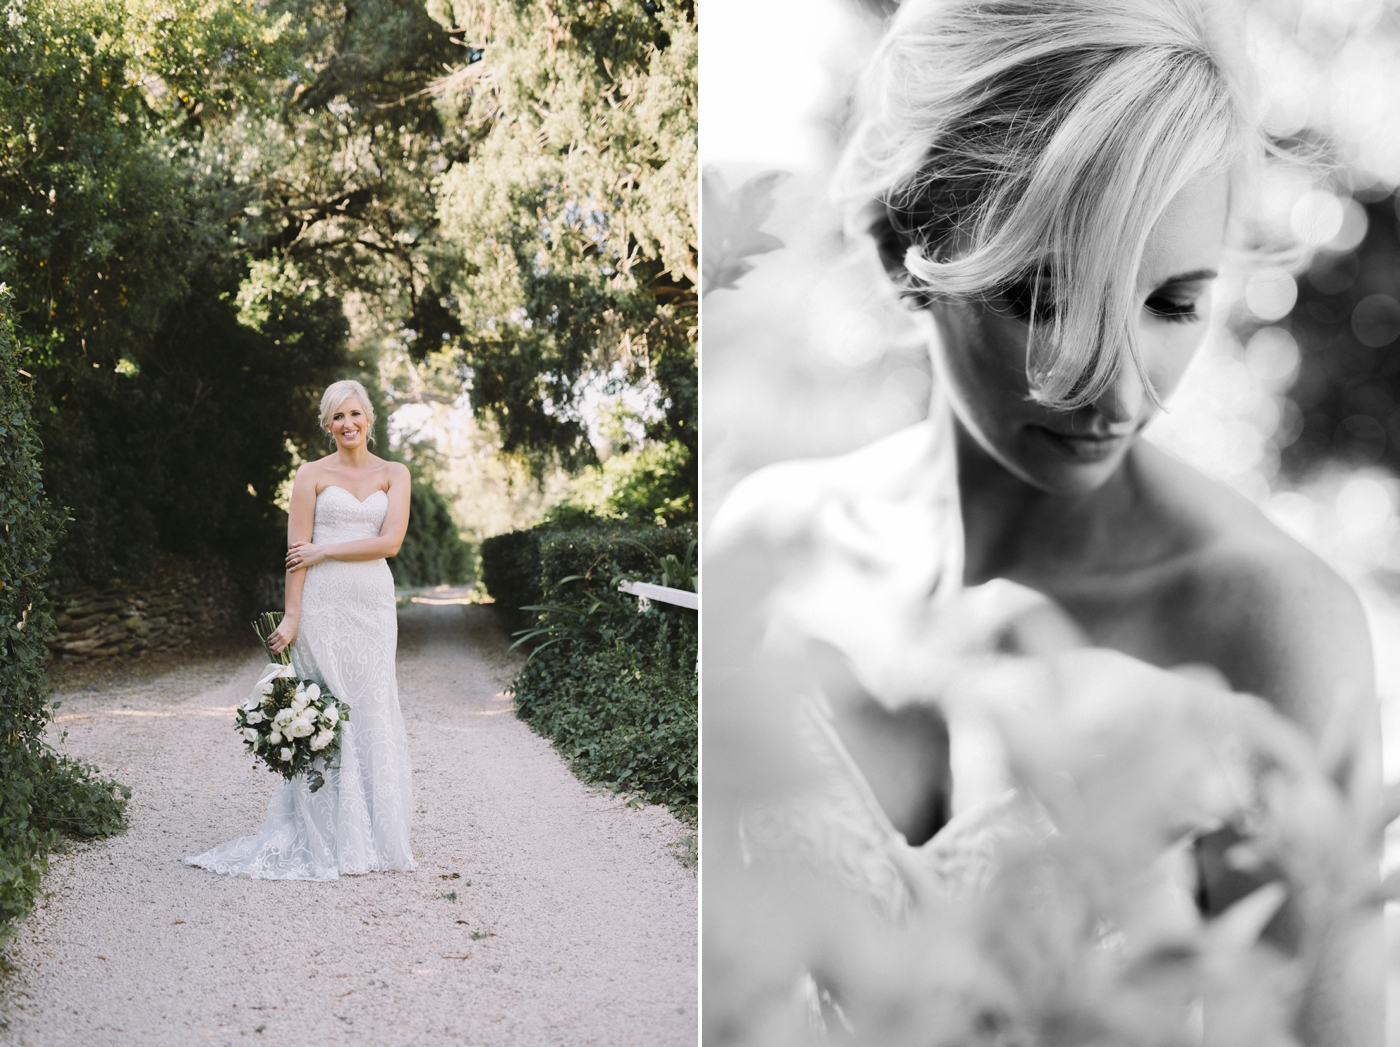 Lauren & Max - Marybank Estate Wedding - Natural wedding photographer in Adelaide - www.katherineschultzphotography.com 76